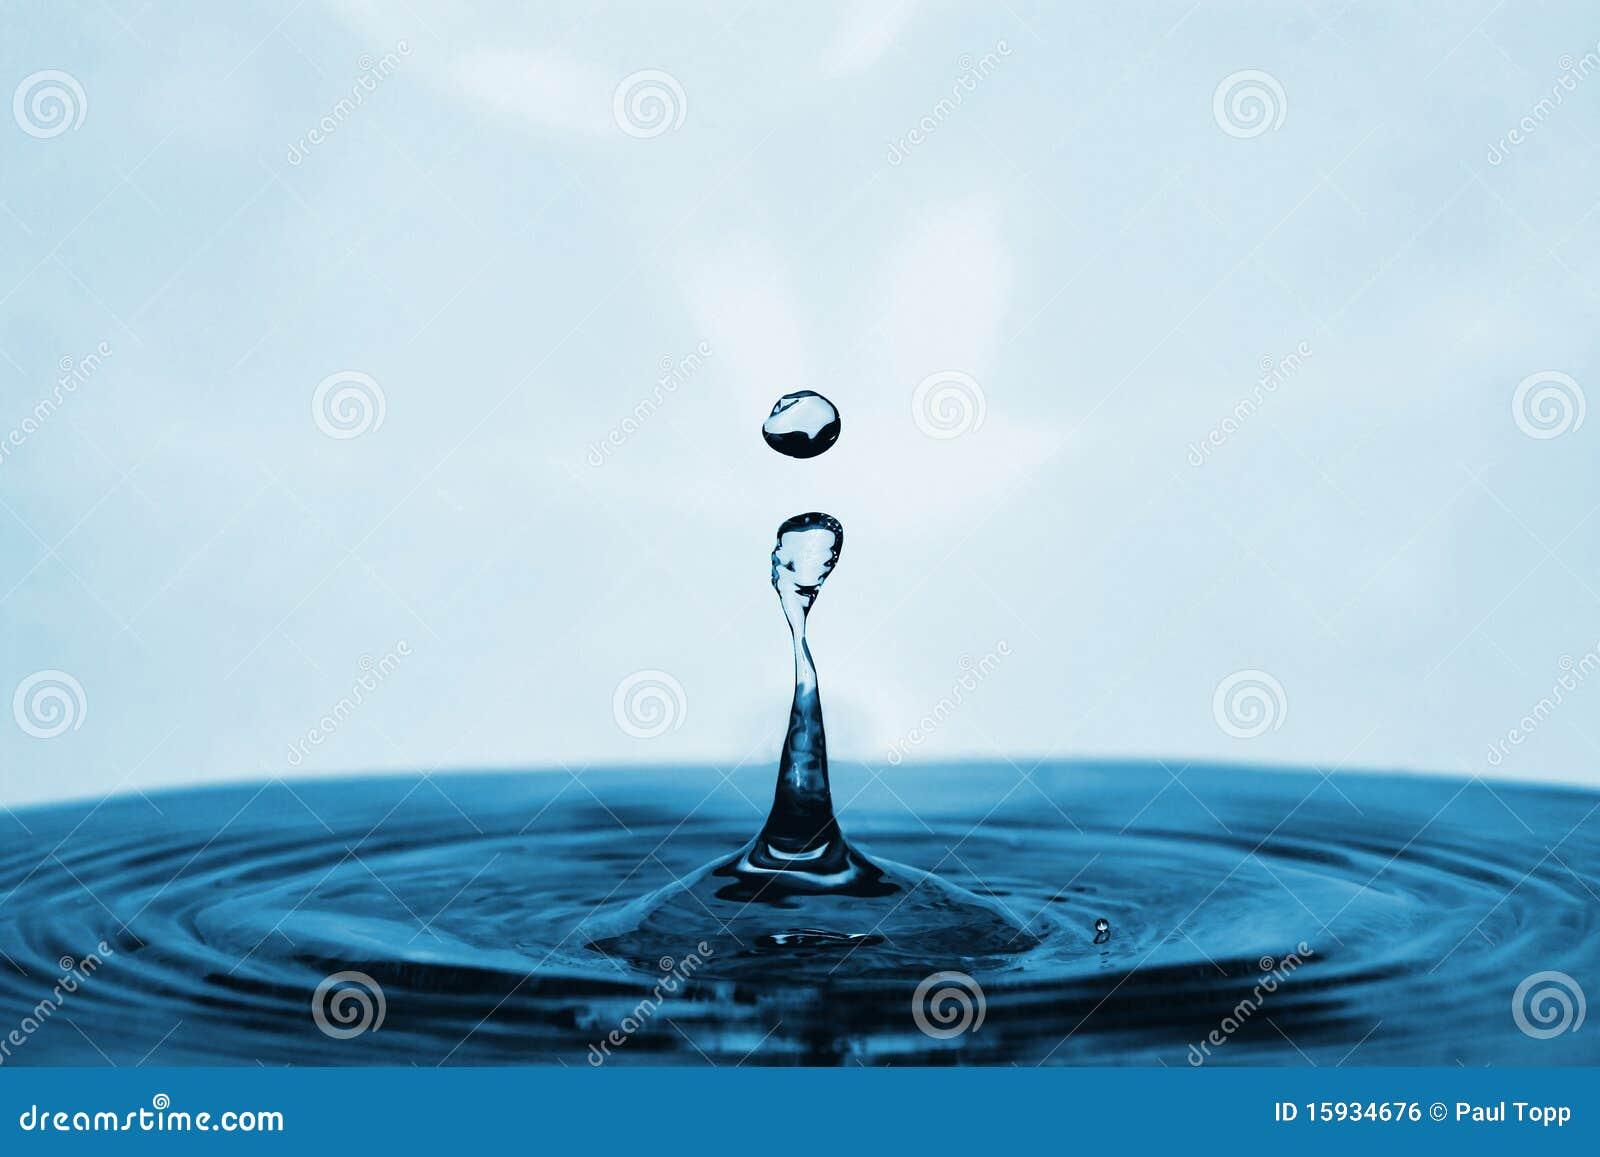 Blue Water Drop Landing in a Pool